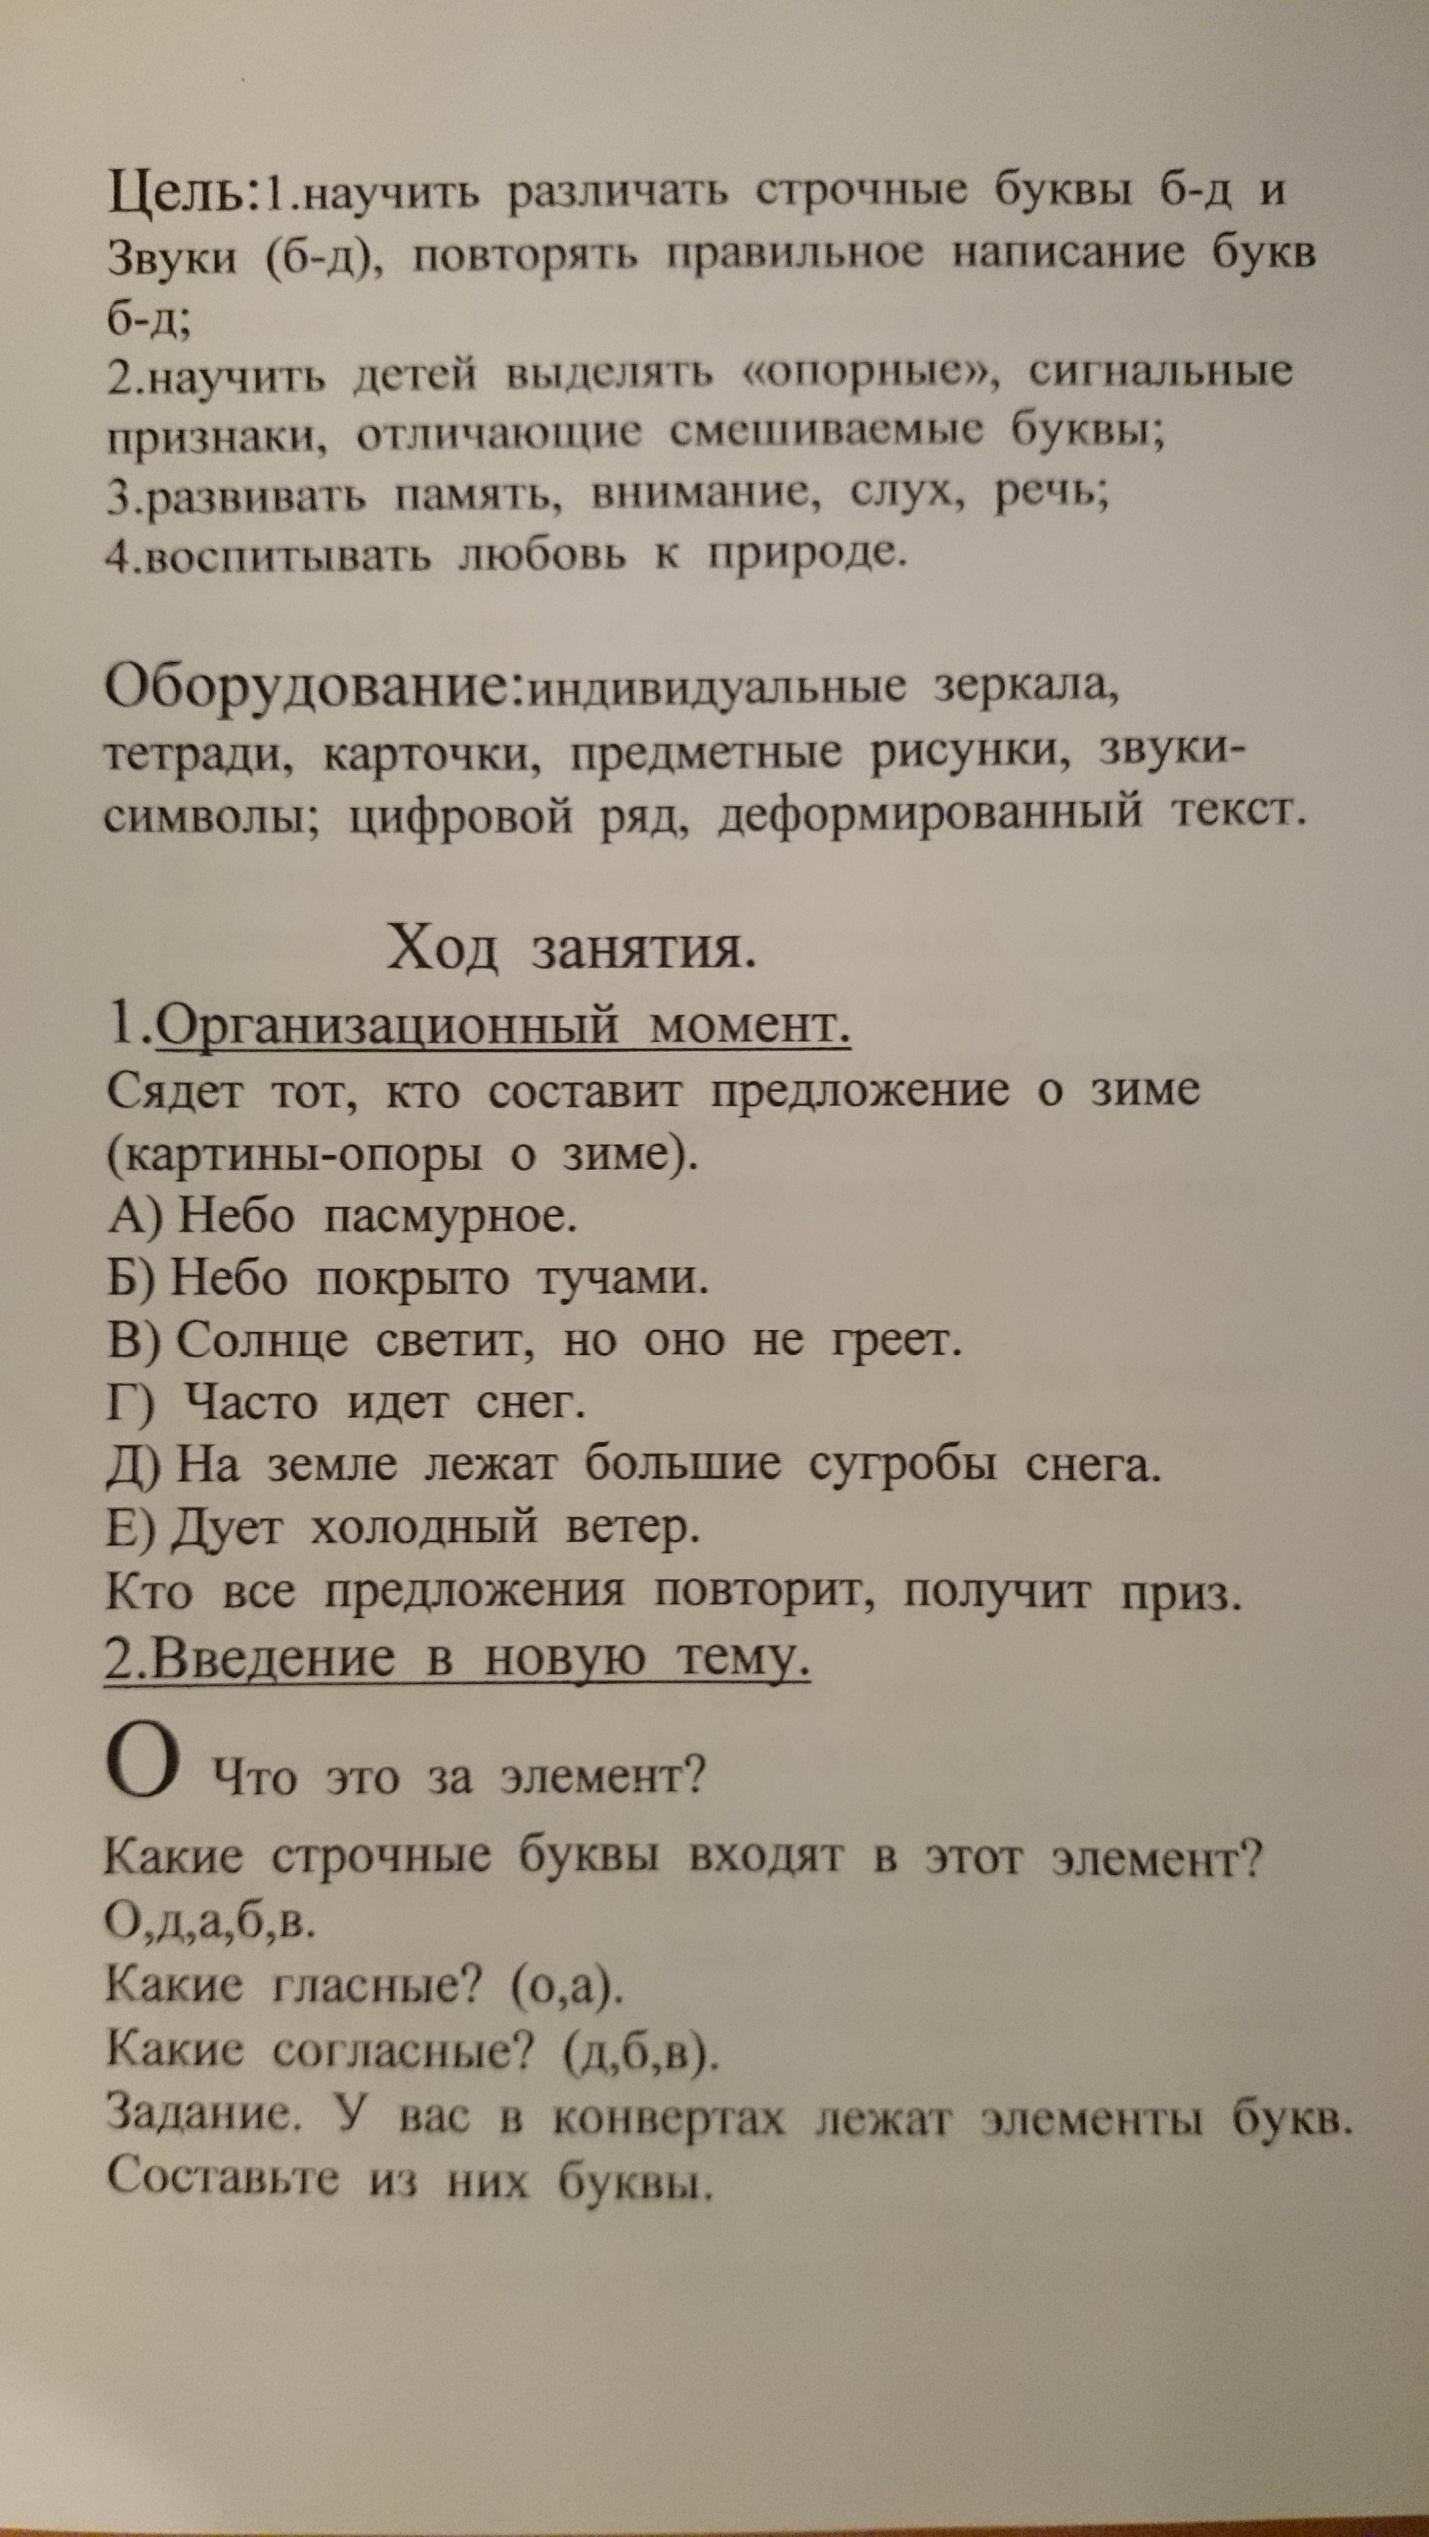 E:\Конспекты\DSC_0530.JPG